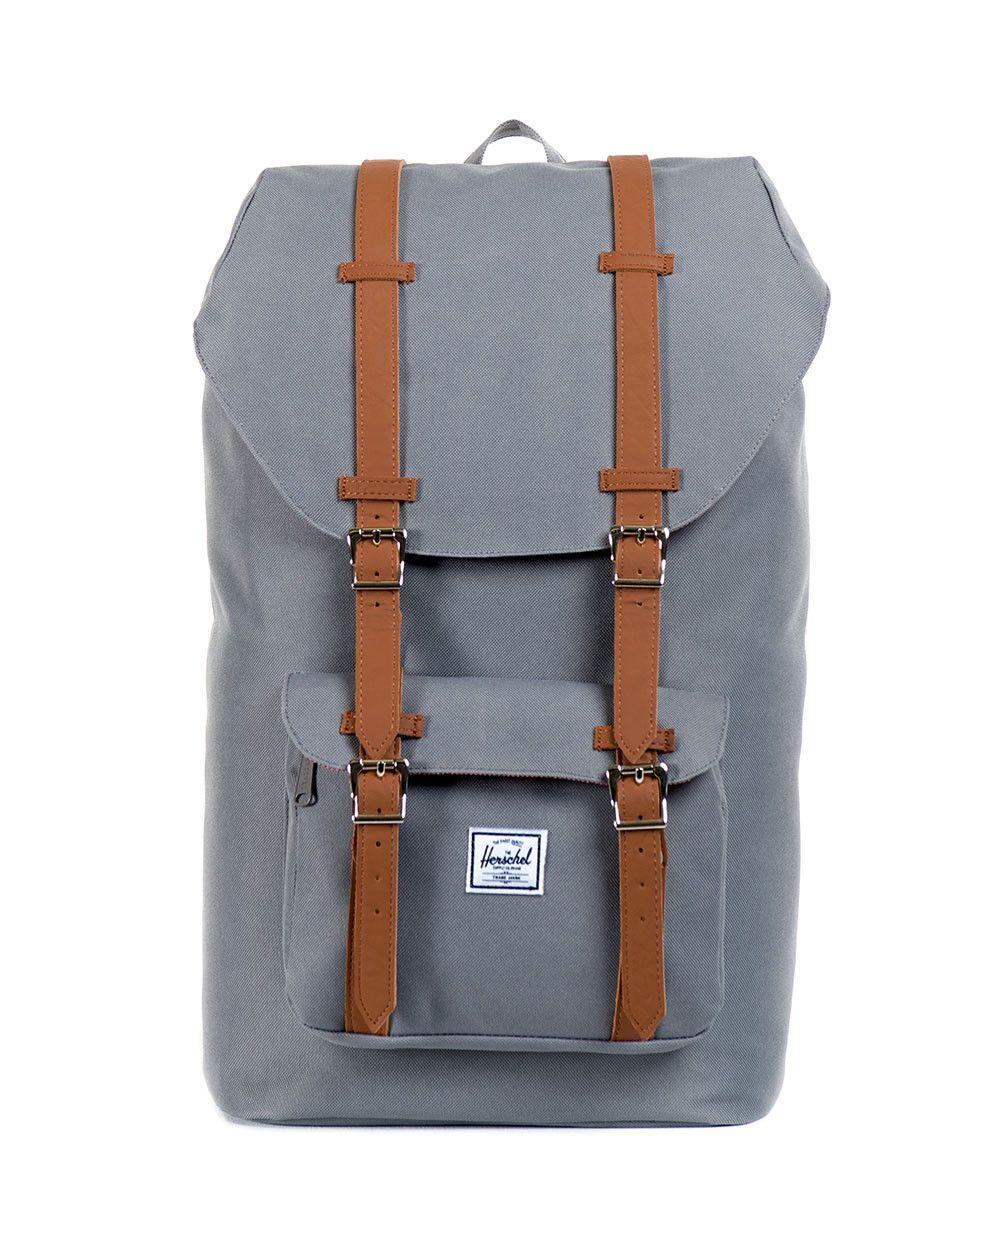 d3cef2e979 Herschel Supply Co. Classic Little America Backpack Herschel Supply Co.